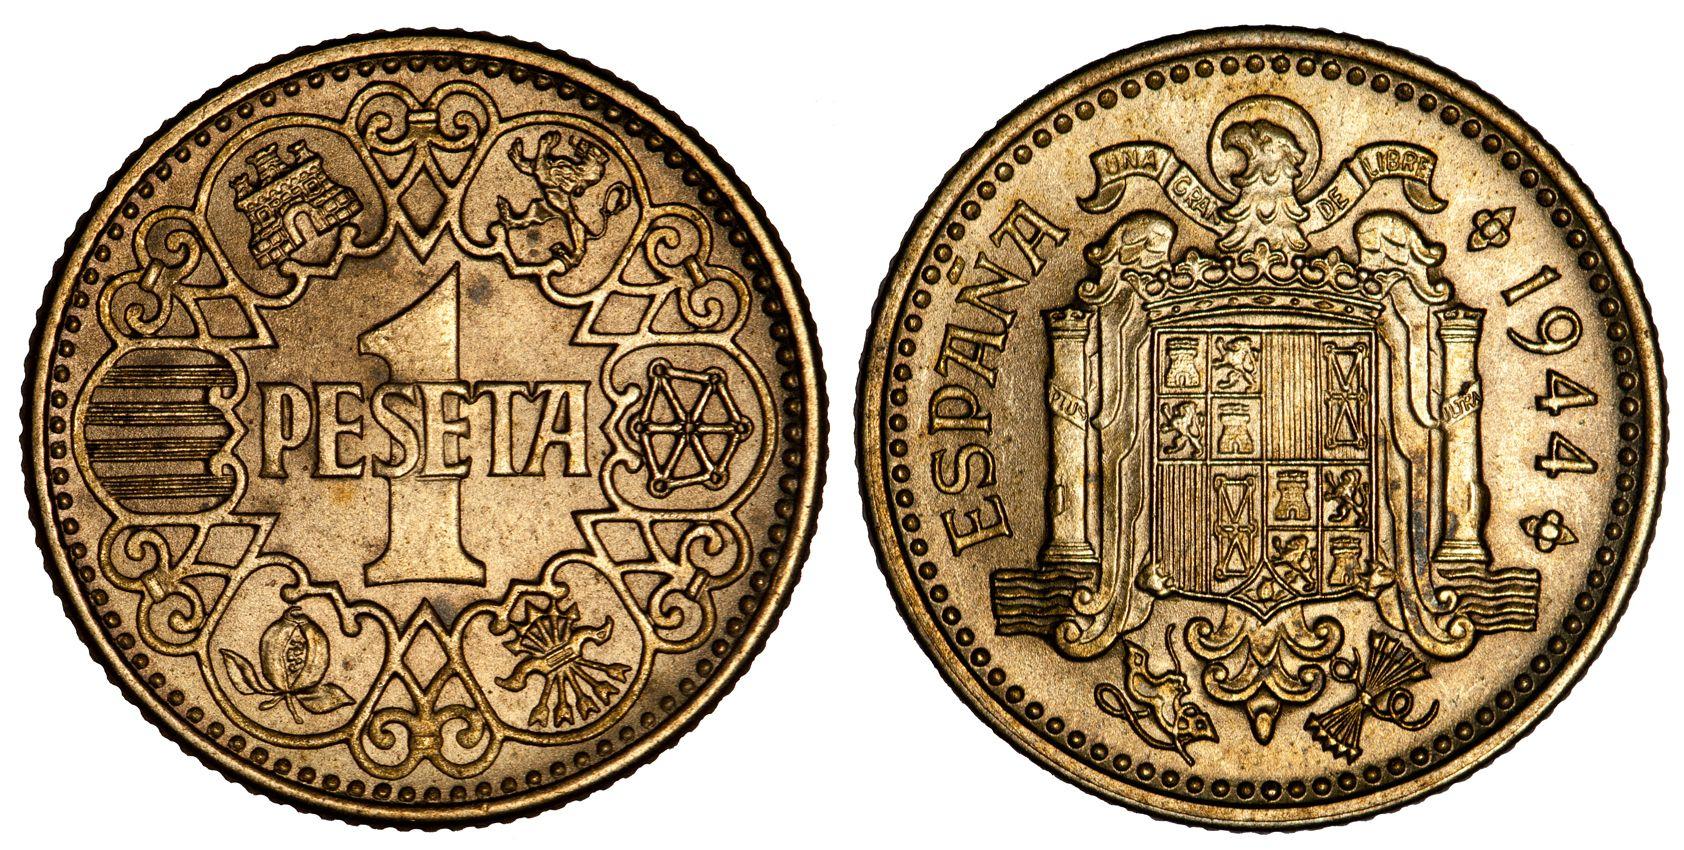 валюта испании фото идеале когда пигмент